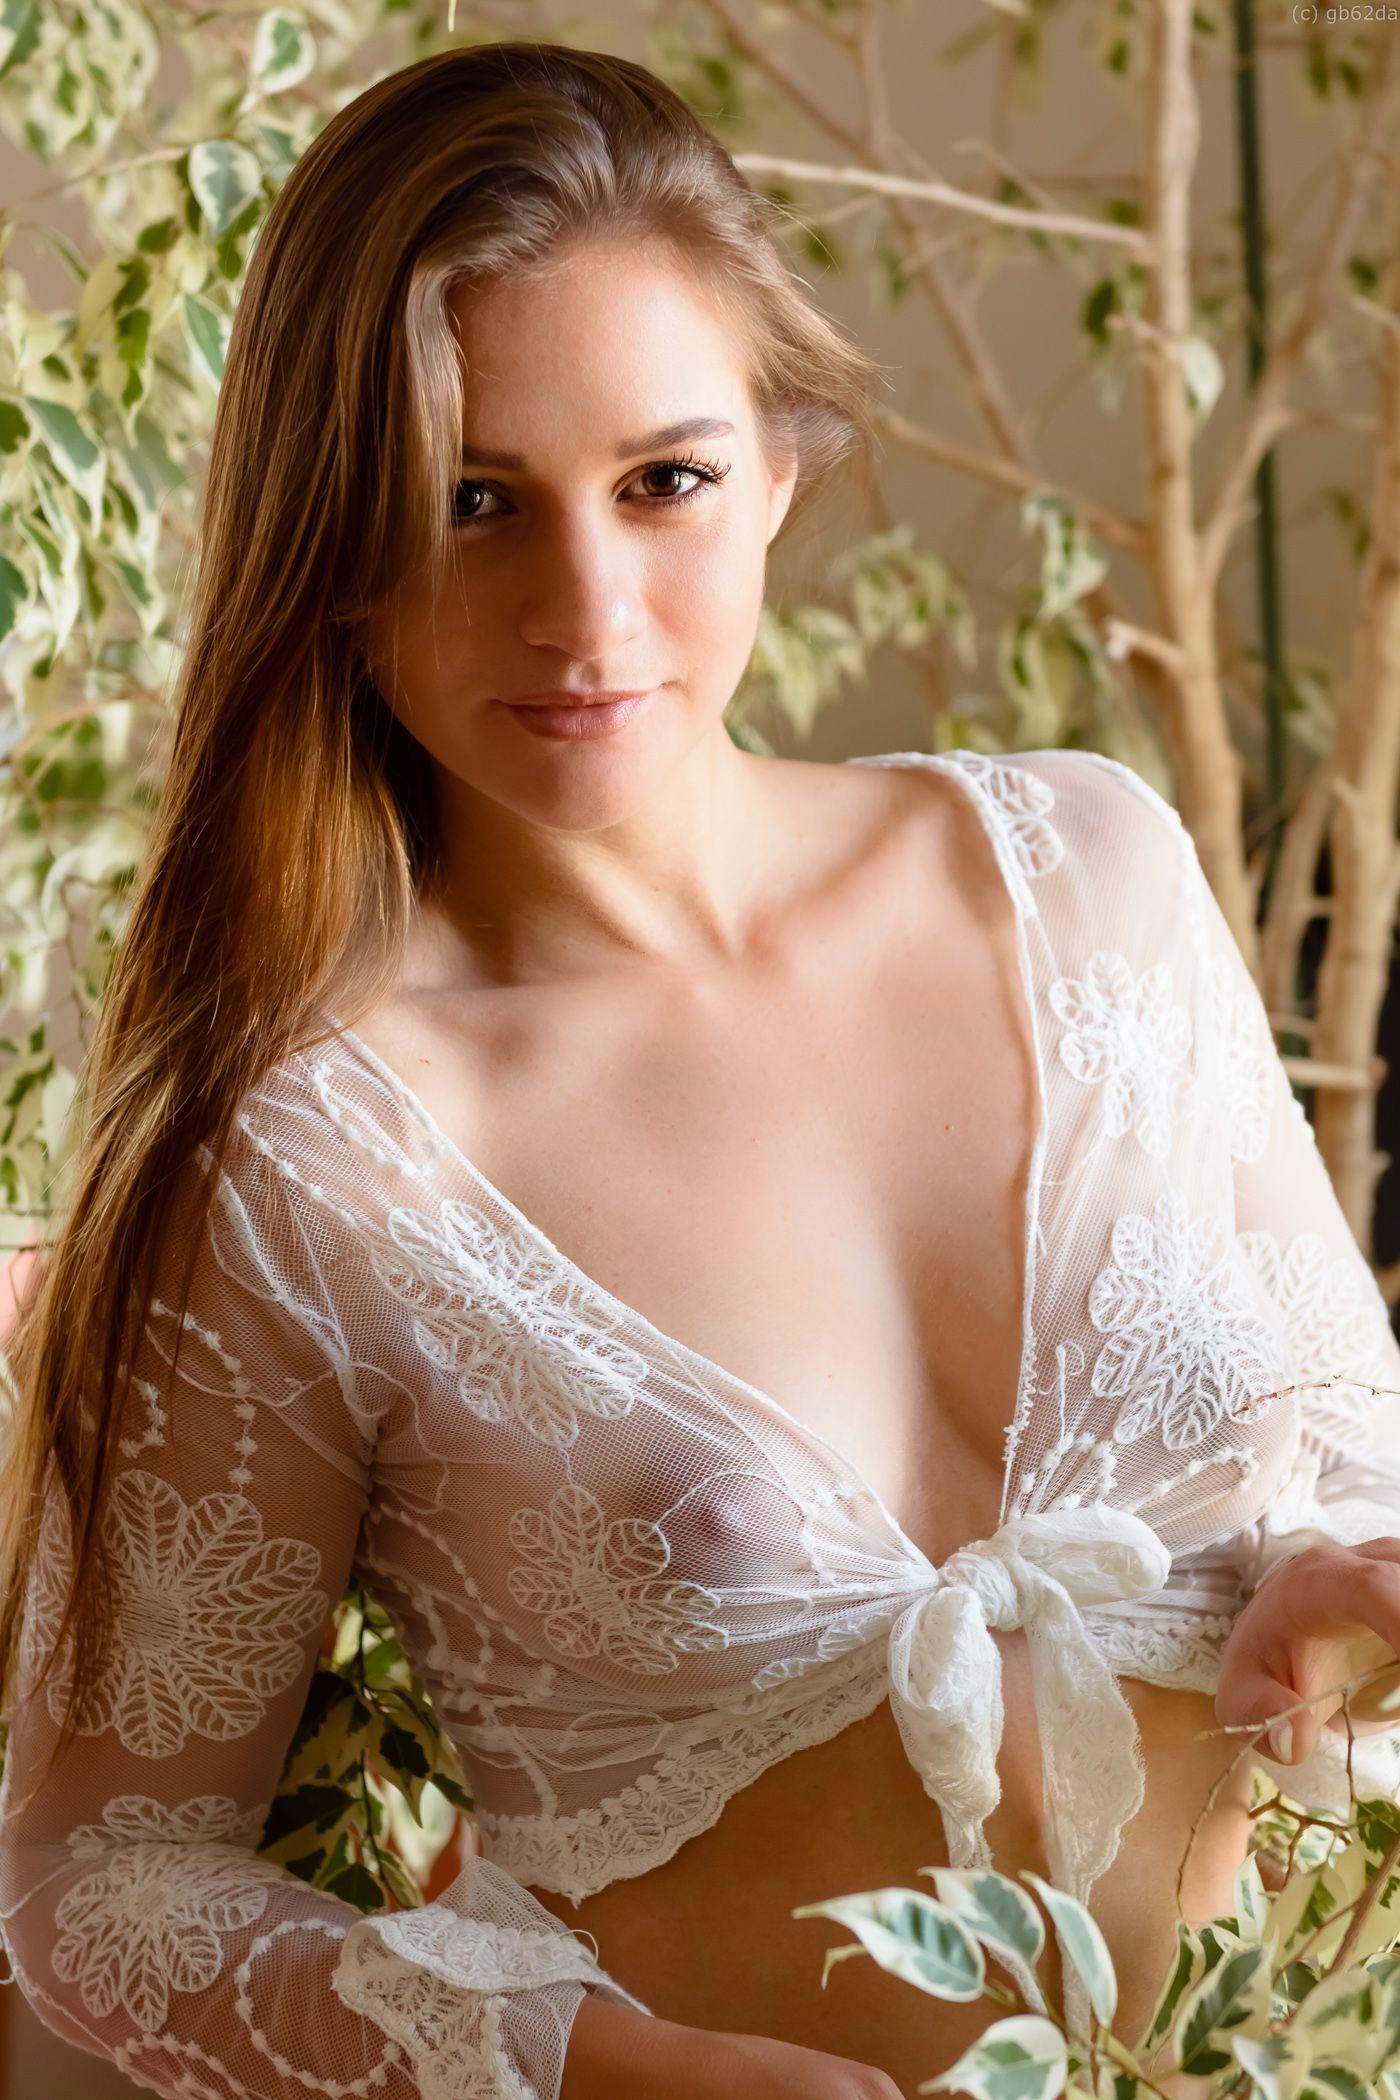 Bella thorne pokie nipples through shirt 5